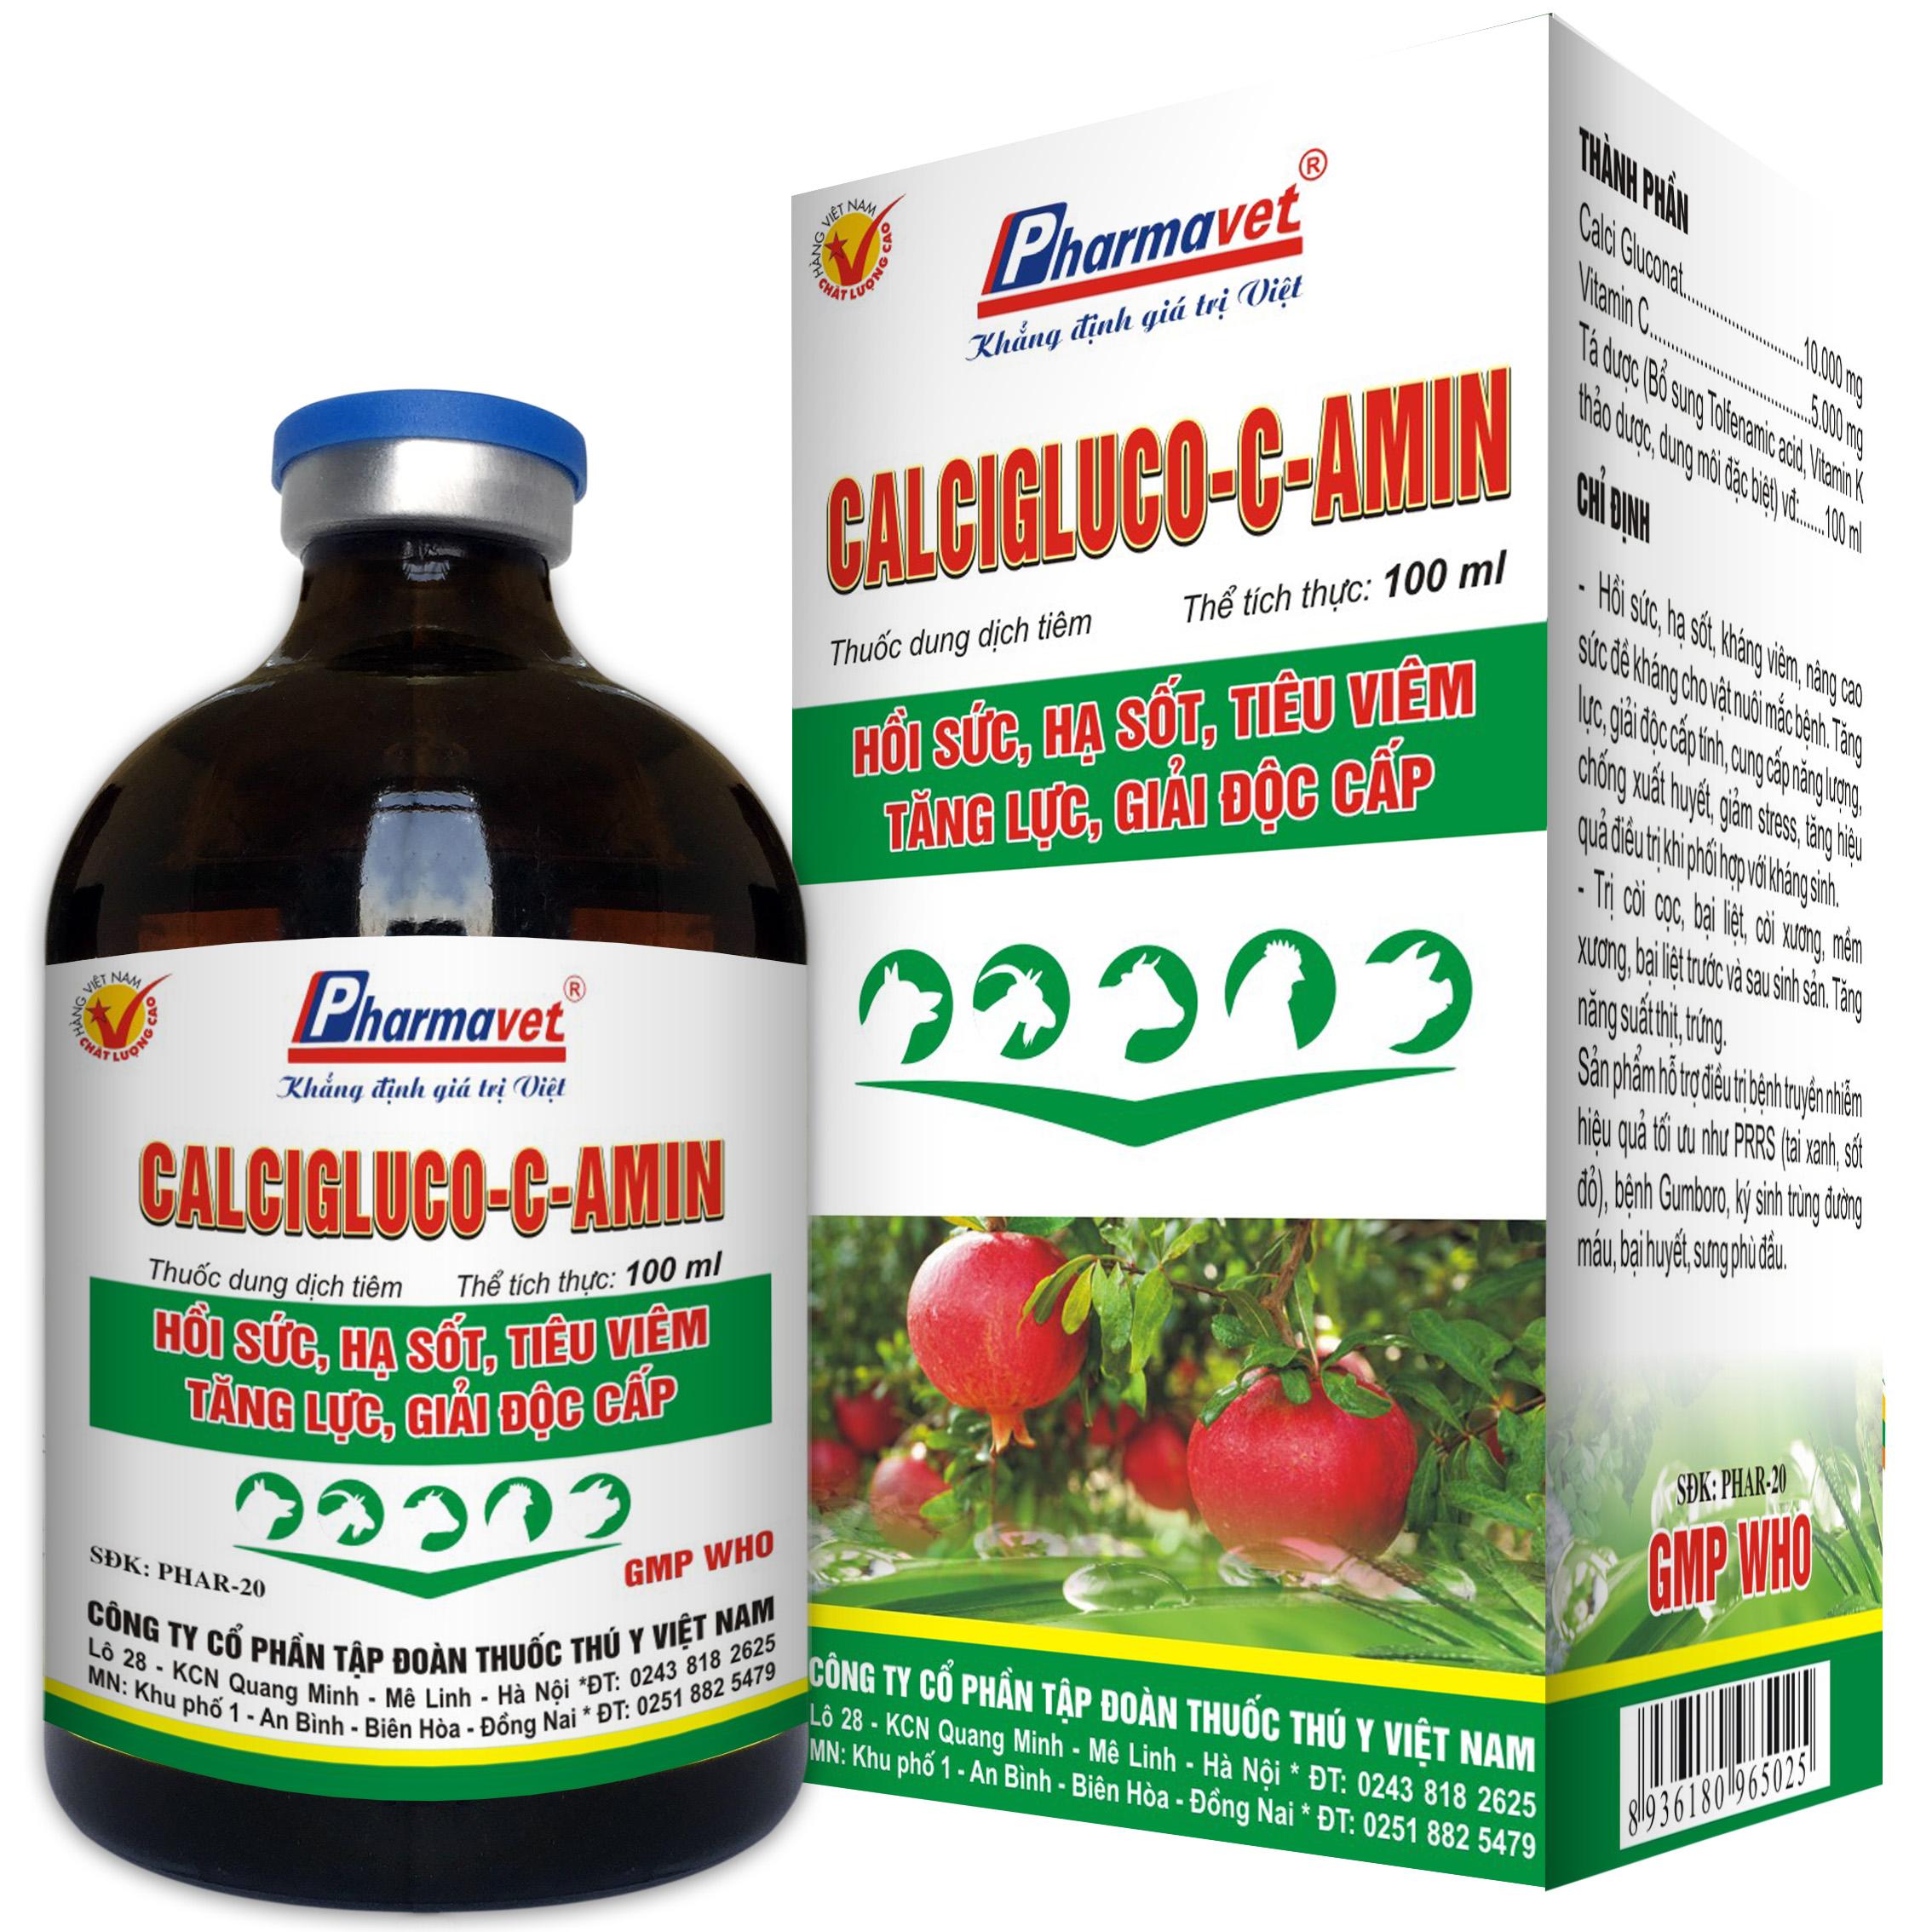 CALCIGLUCO-C-AMIN